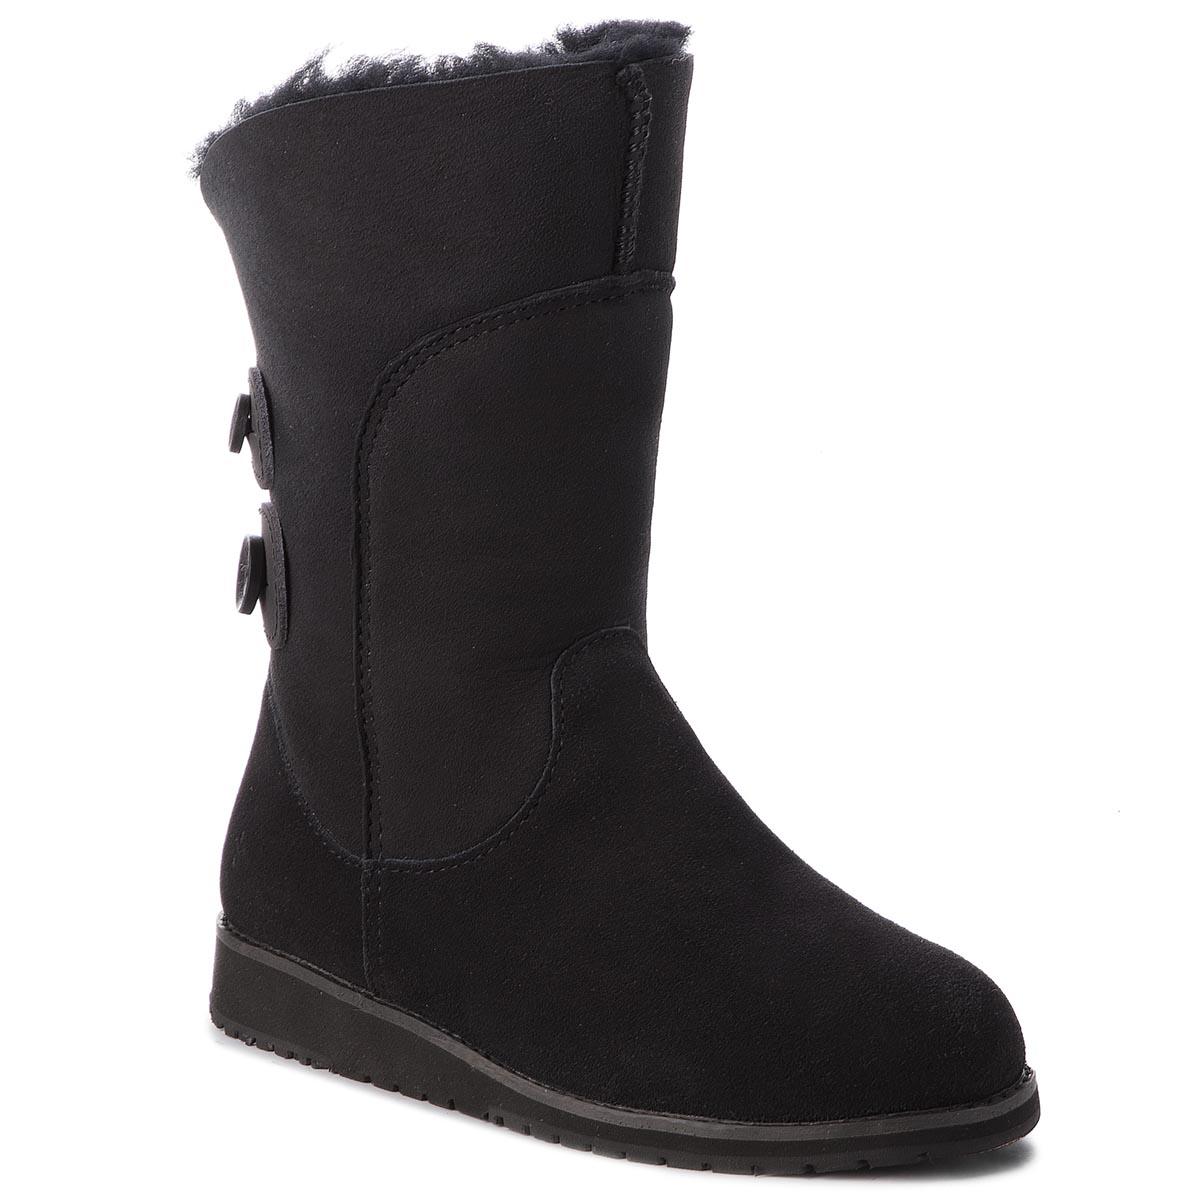 Image of Schuhe EMU AUSTRALIA - Anda W11854 Black